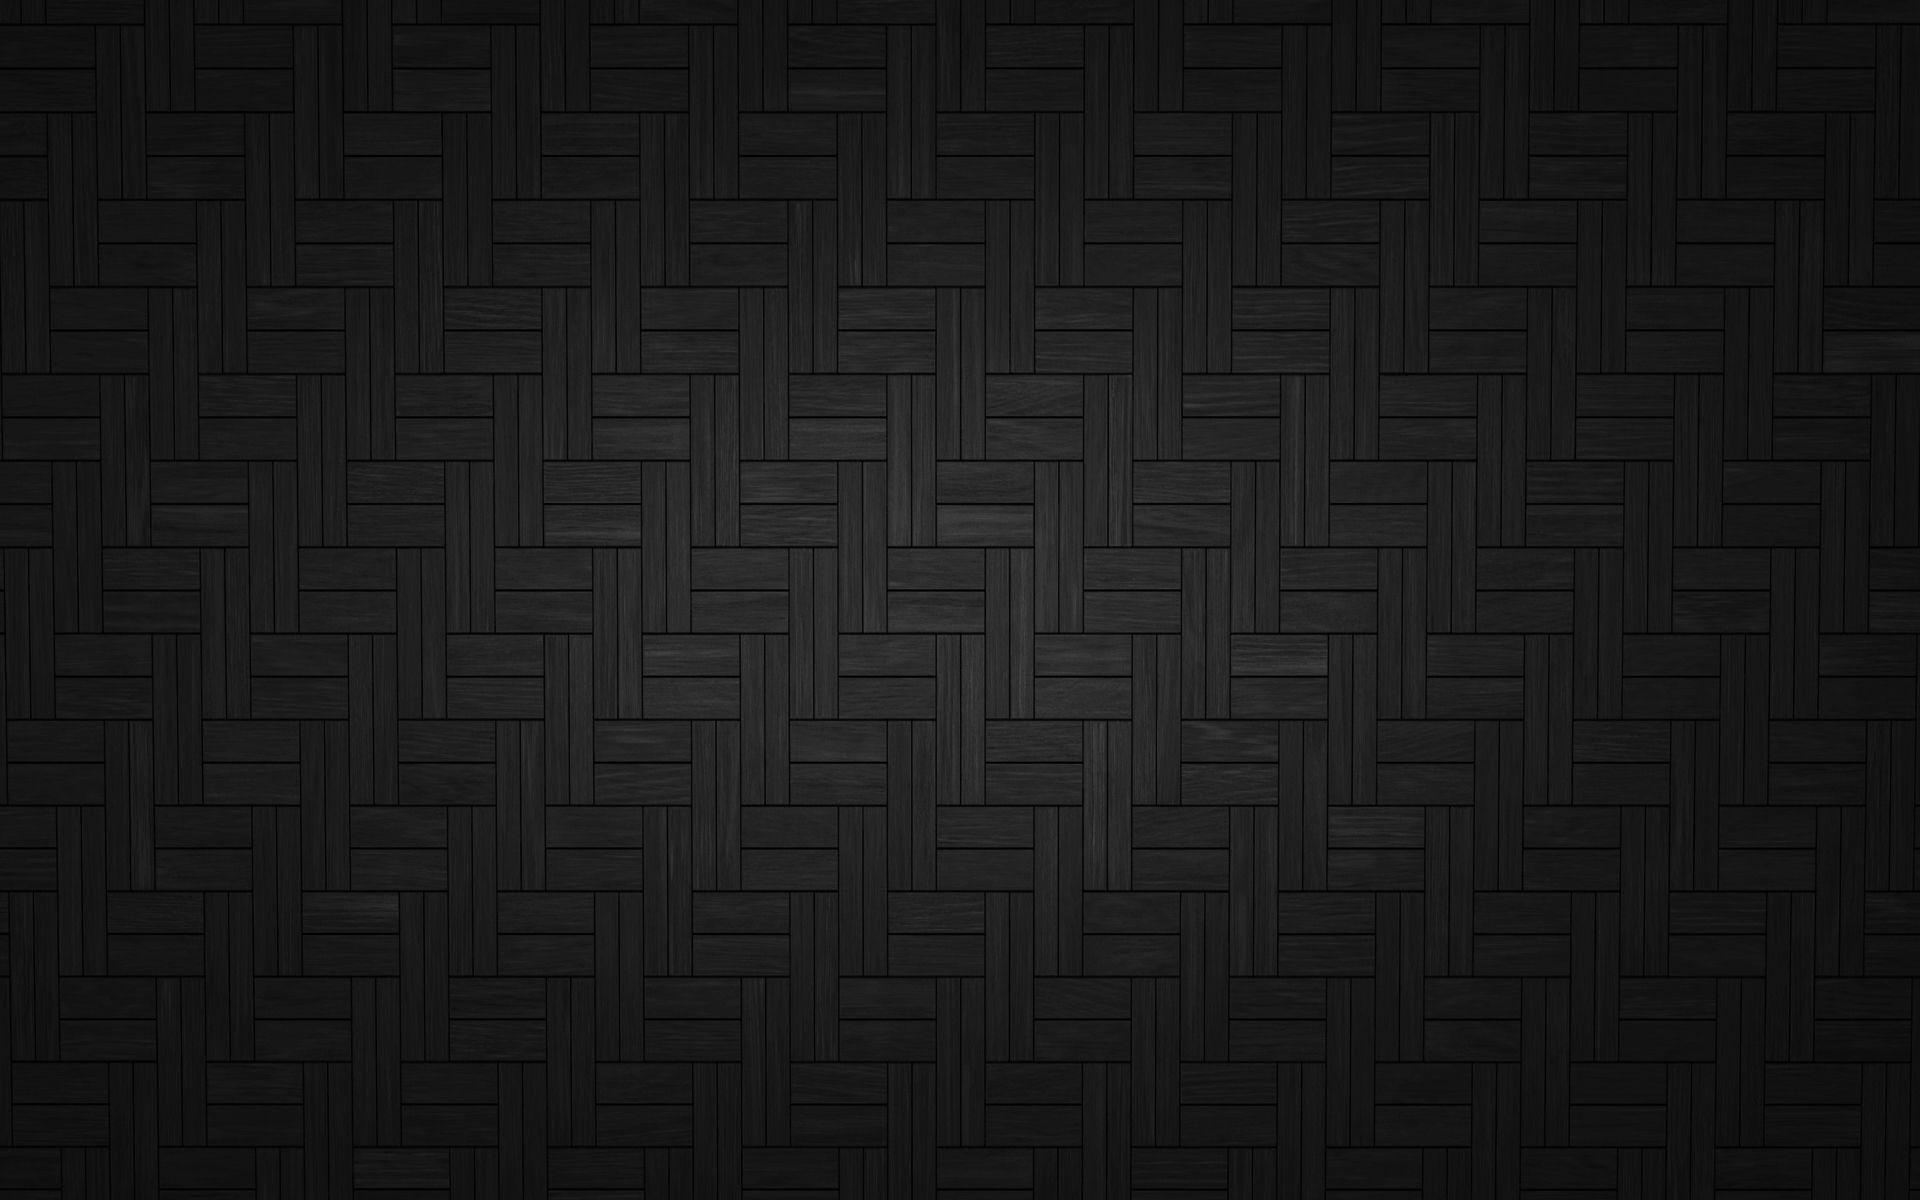 Download Black Blank Wallpaper Hd Cikimm Com